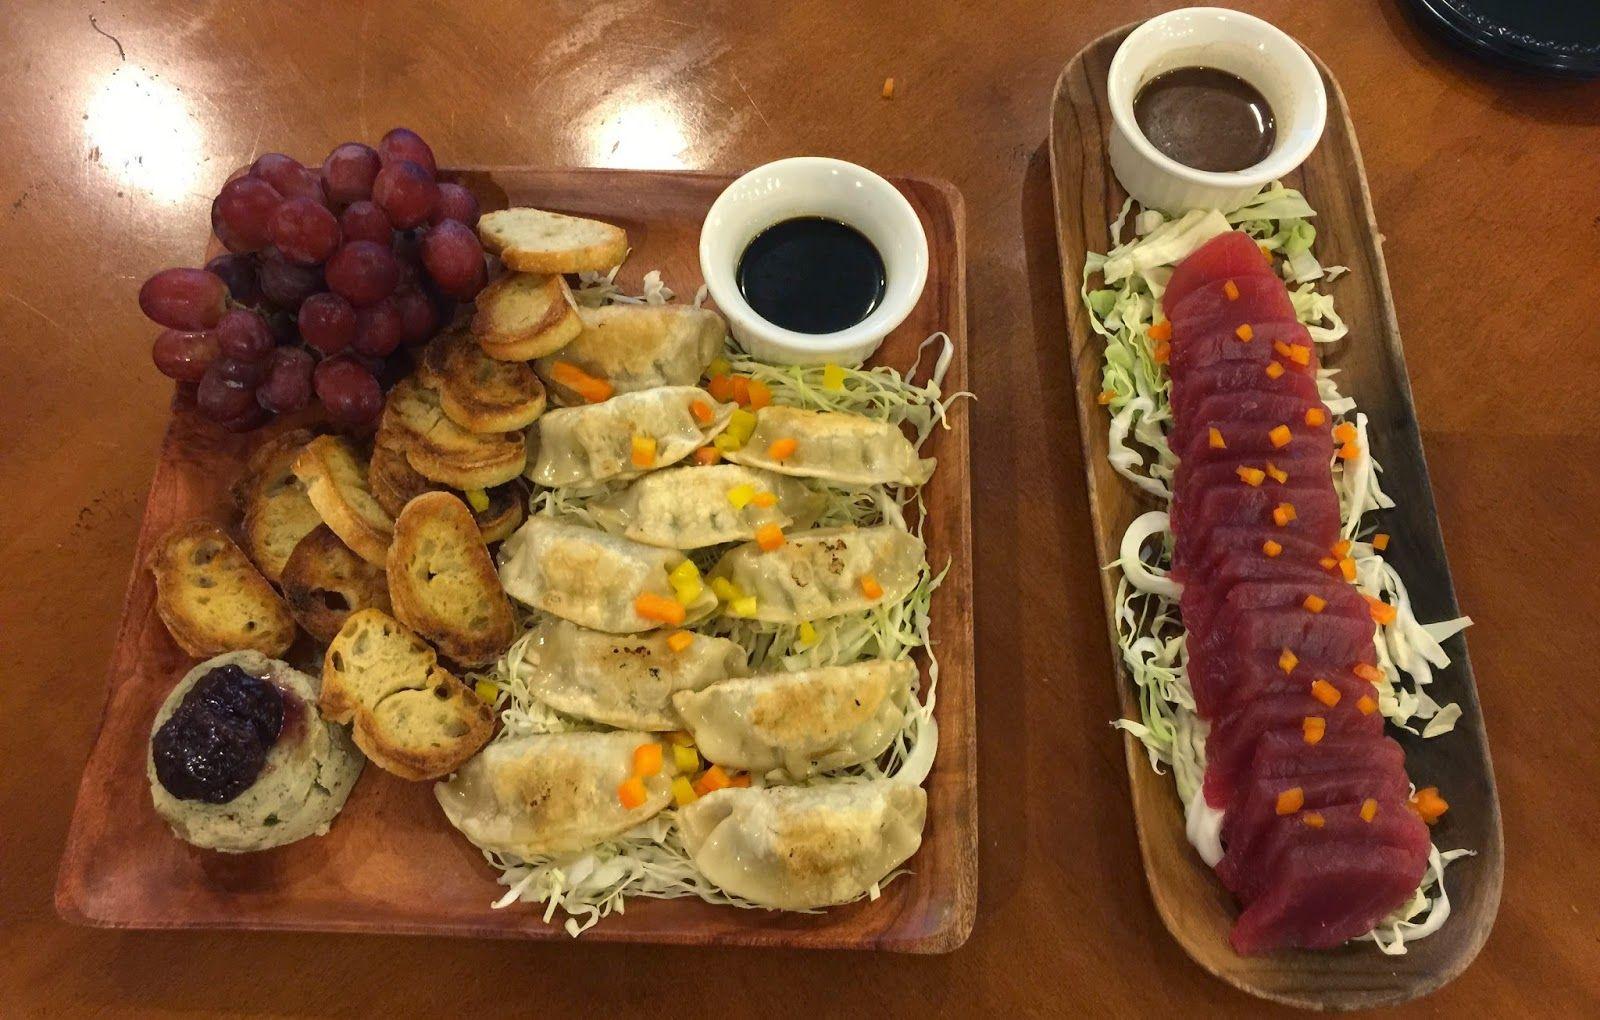 TASTE OF HAWAII CORNISH GAME HENS NEW YEAR'S EVE DINNER